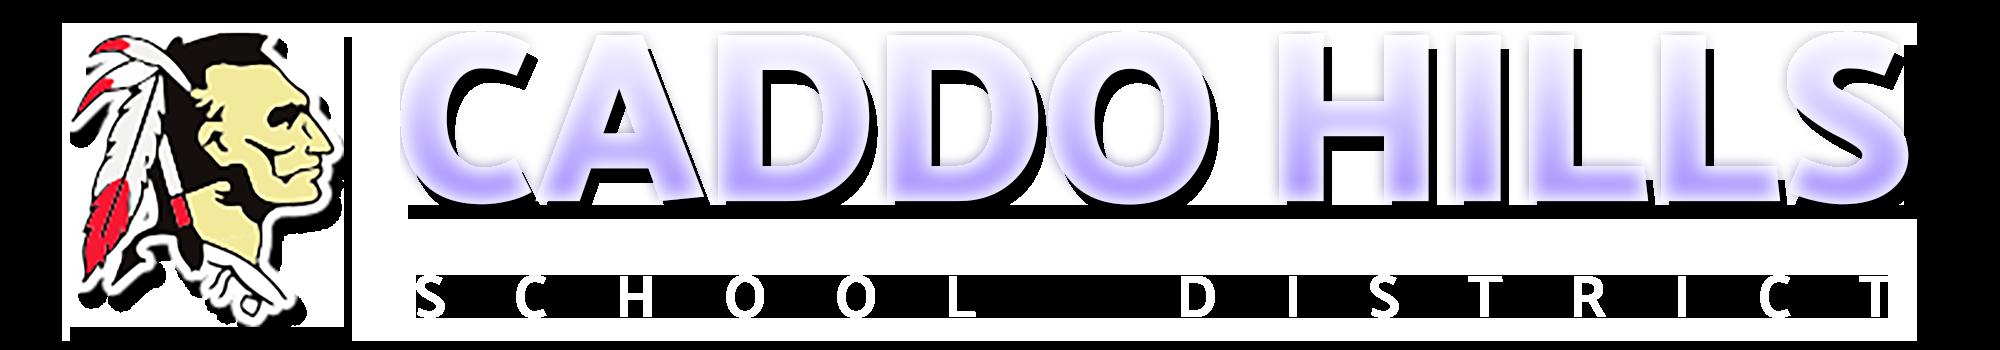 CADDO HILLSLogo